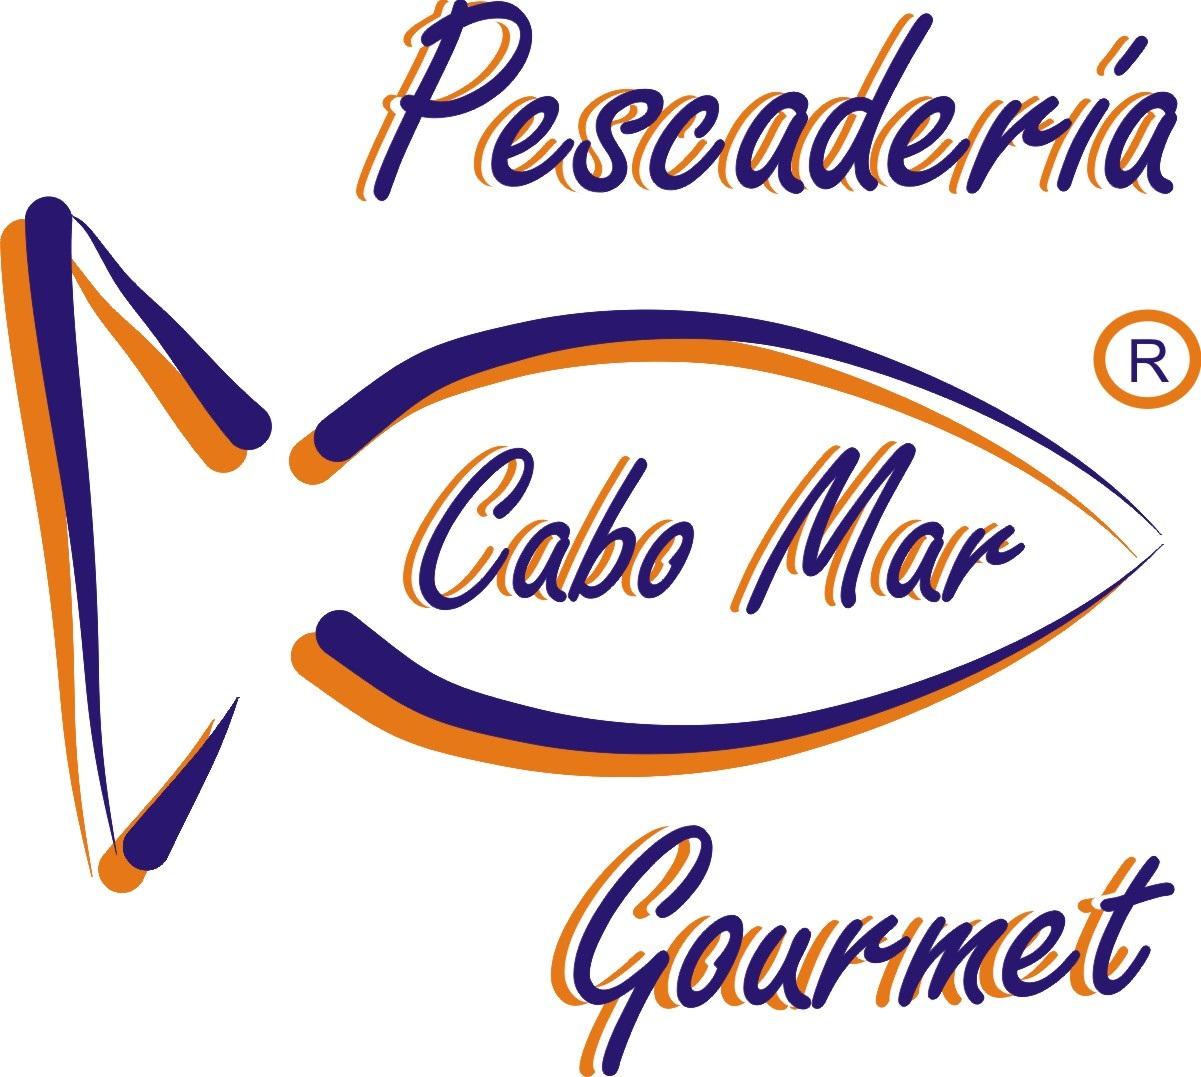 Cabo Mar Pescaderia